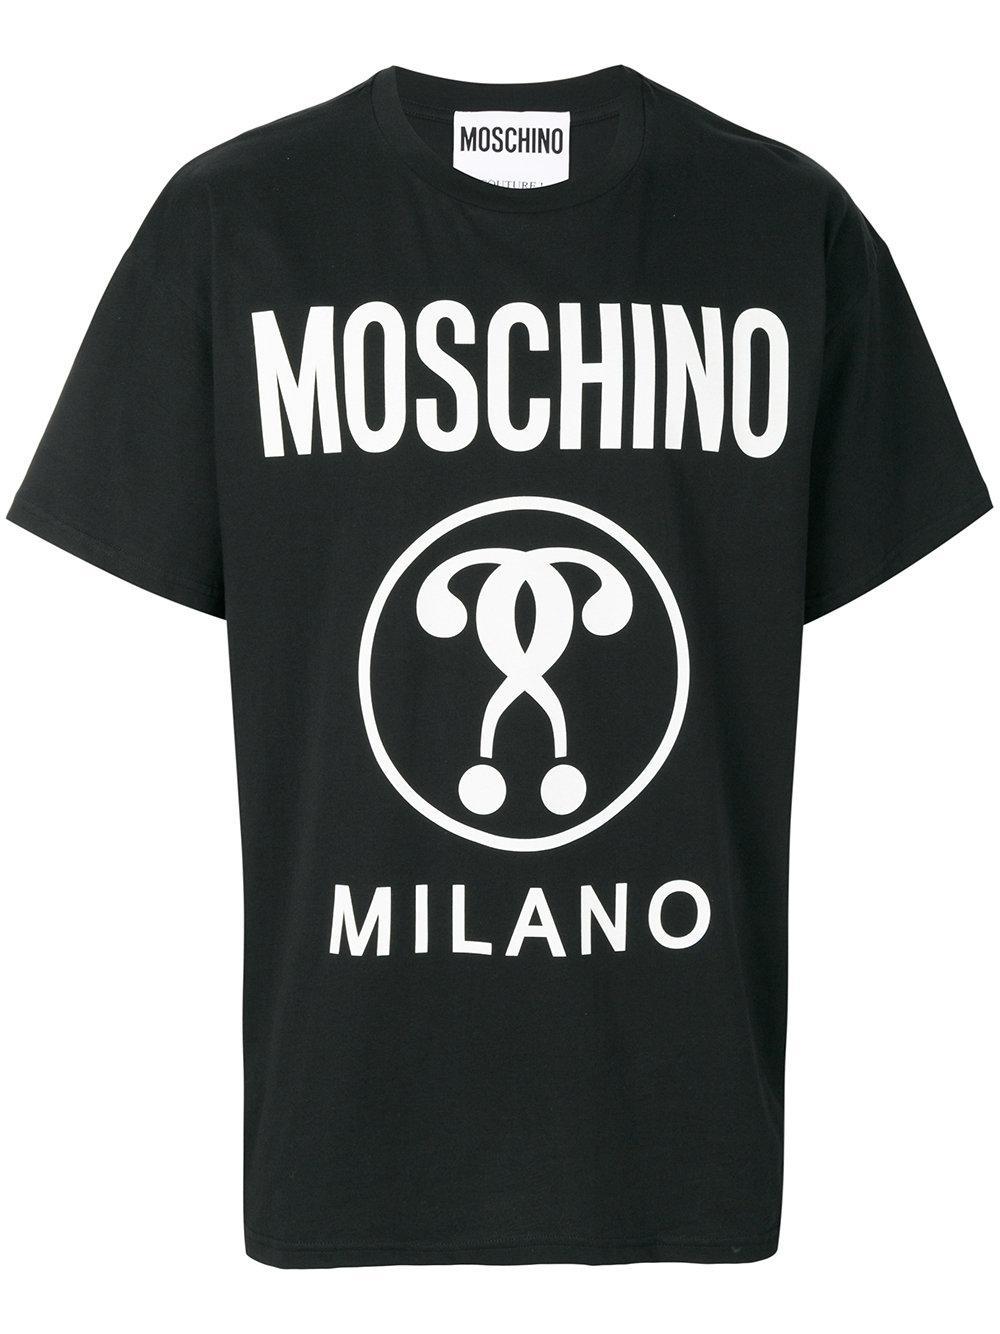 Moschino logo print t shirt in black for men lyst for Print logo on shirt